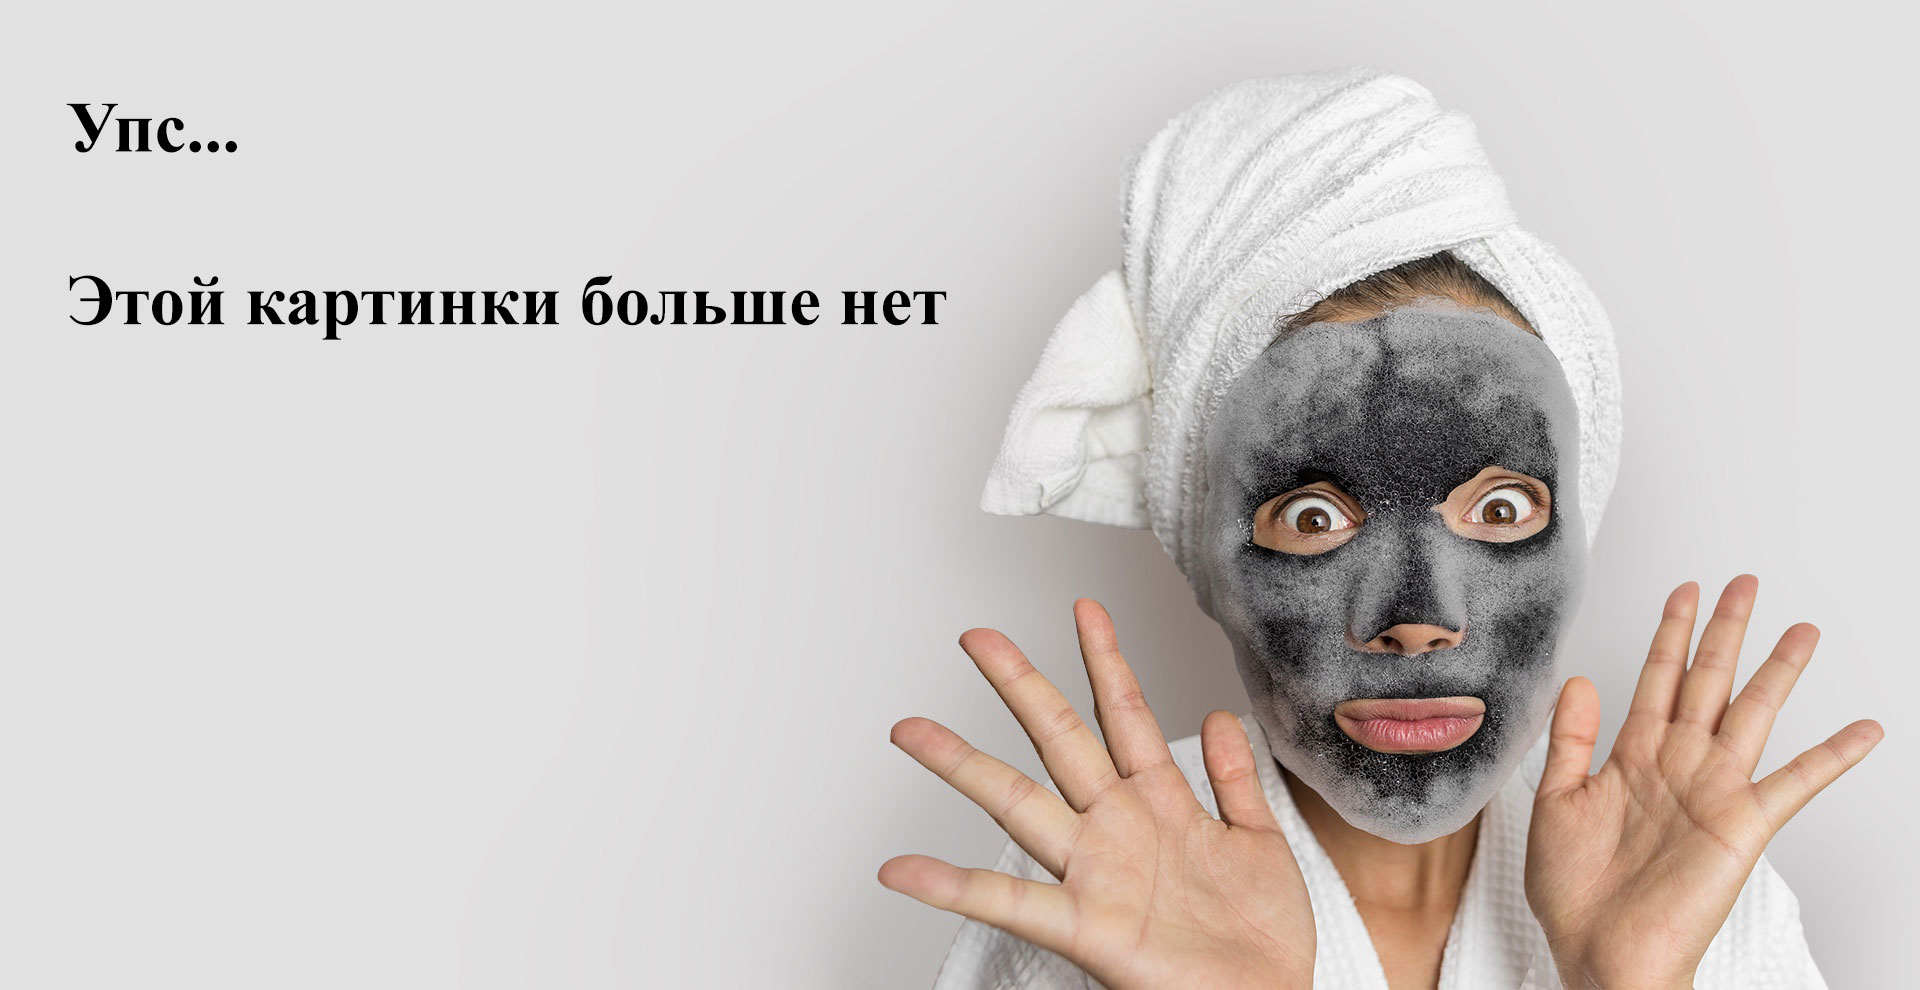 Levrana, Зубная паста «Антимикробная», 75 мл